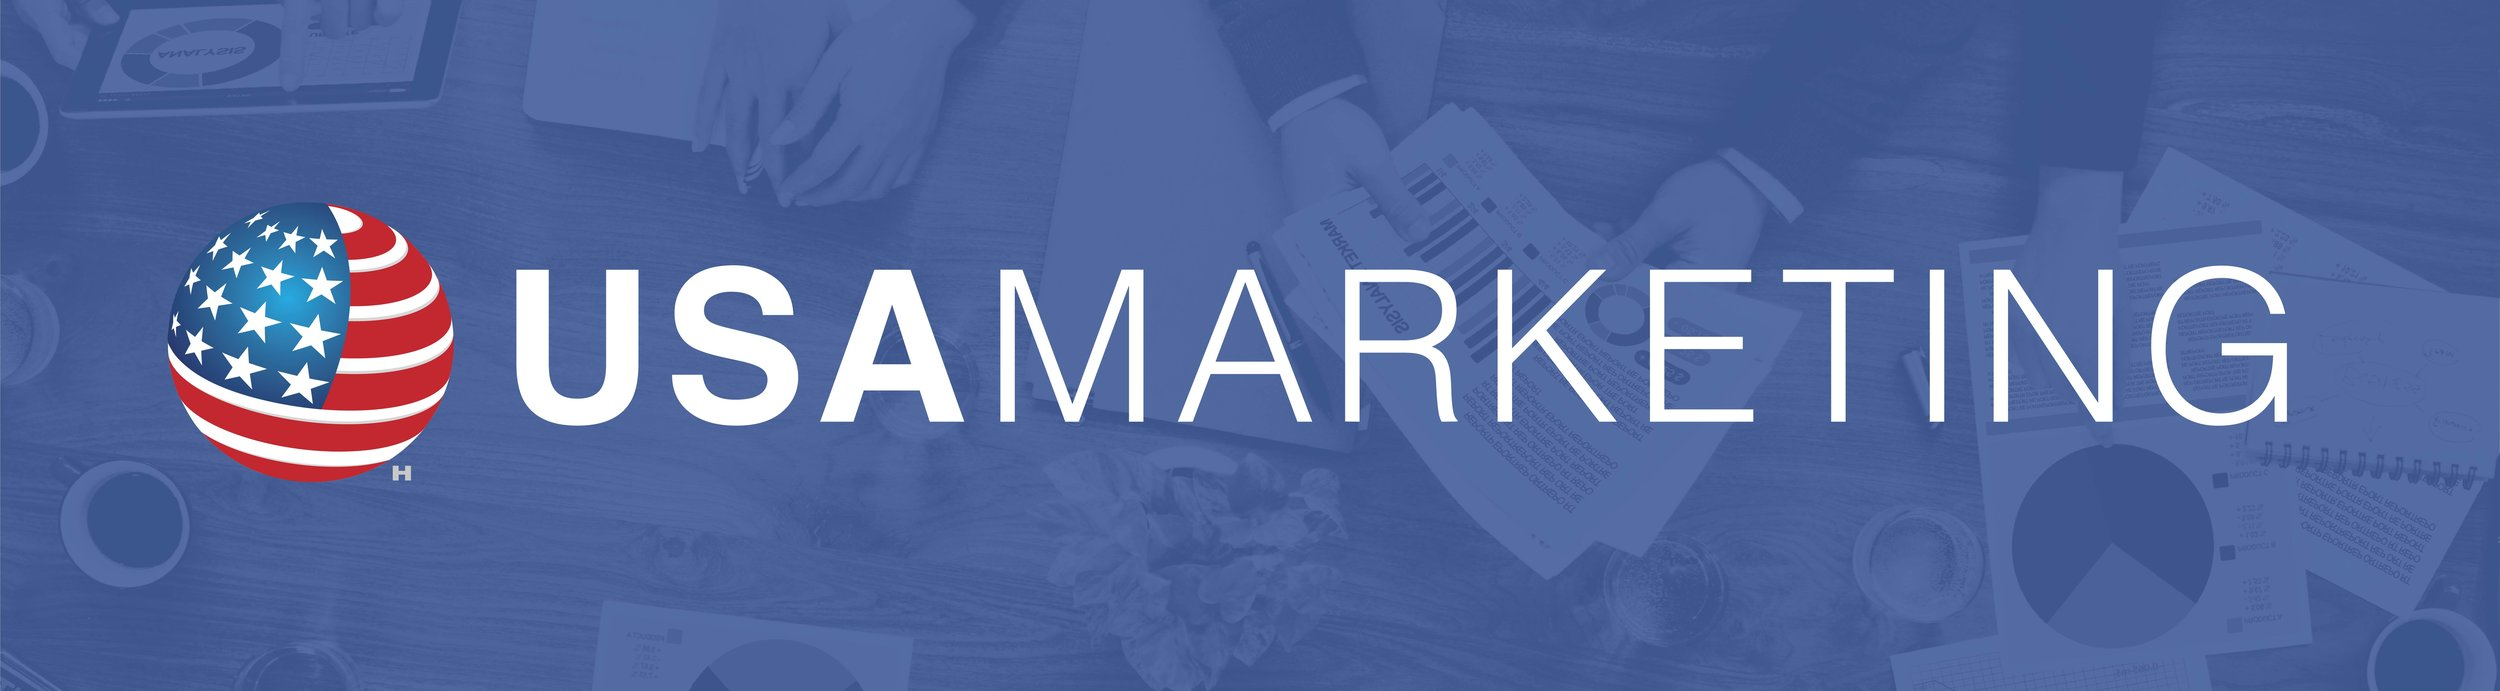 USA_Marketing-02.jpg